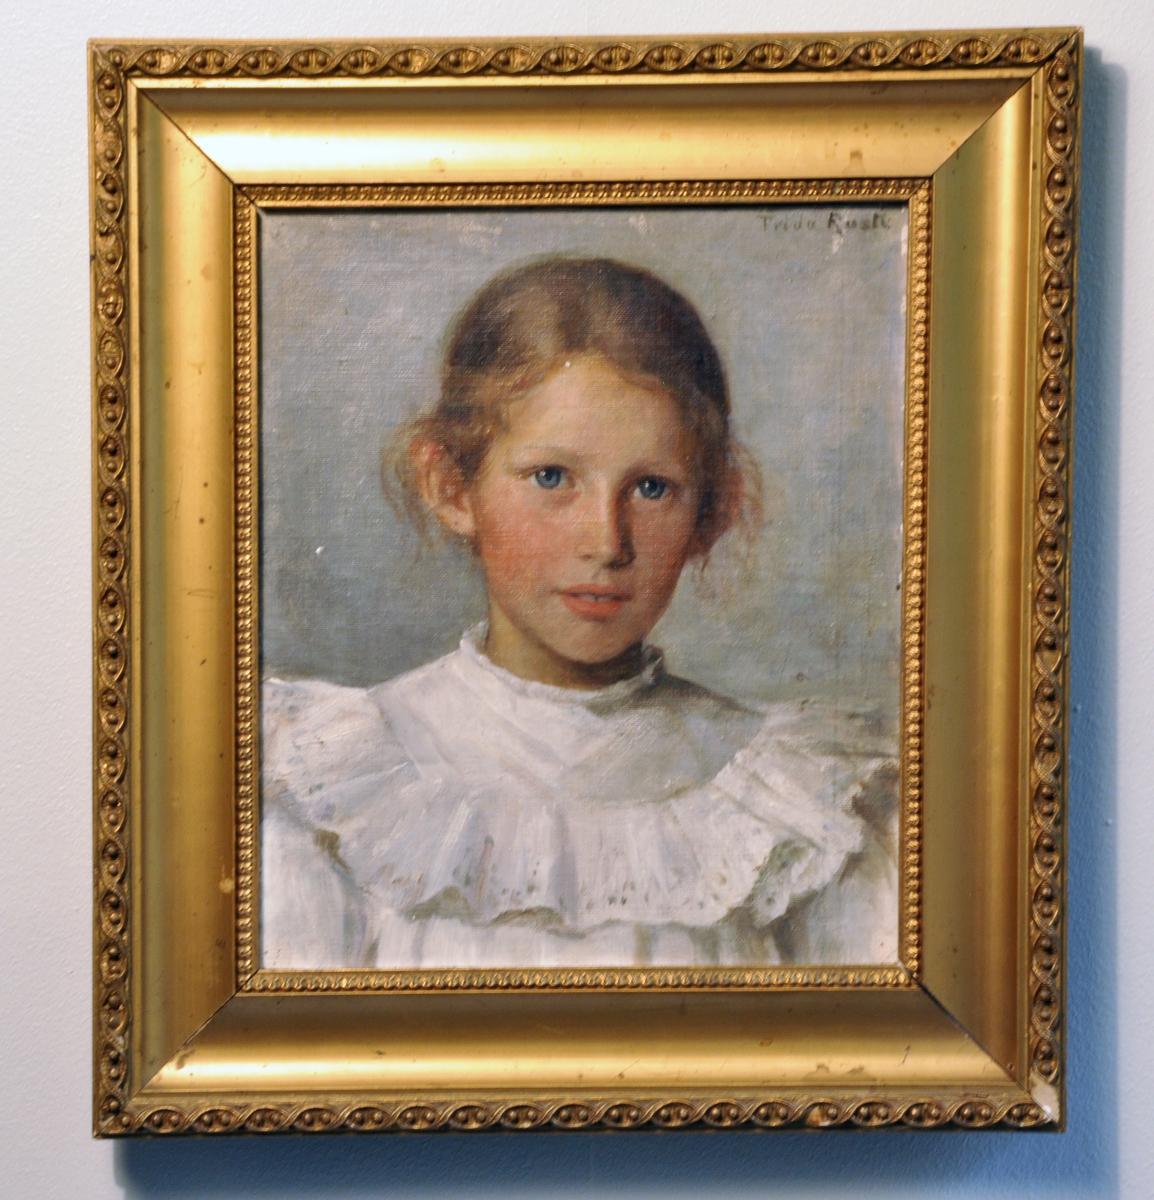 Portrett av Ingeborg Flood Rusten som barn.